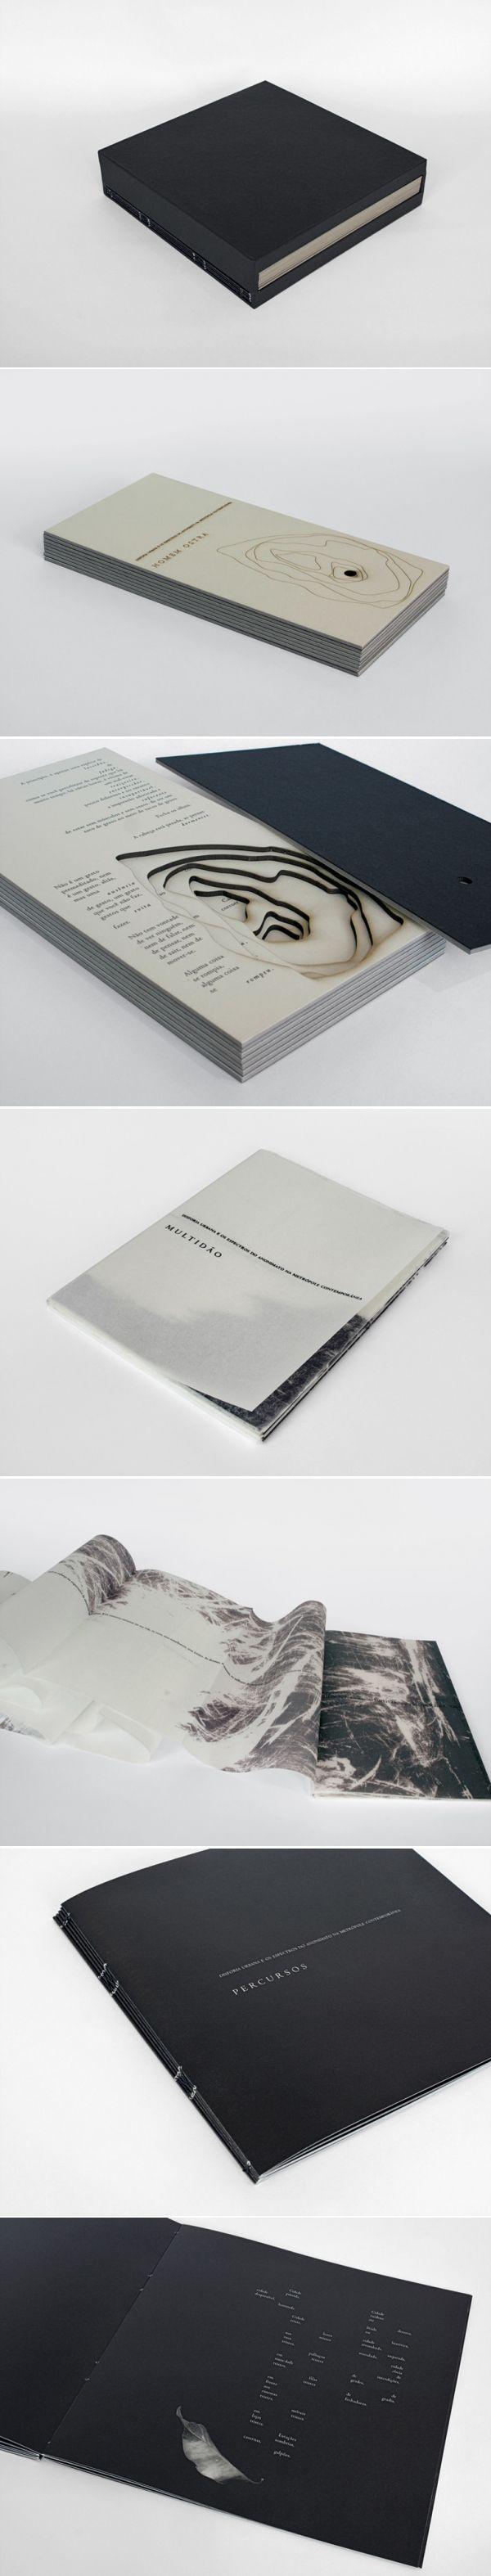 livre-objet //